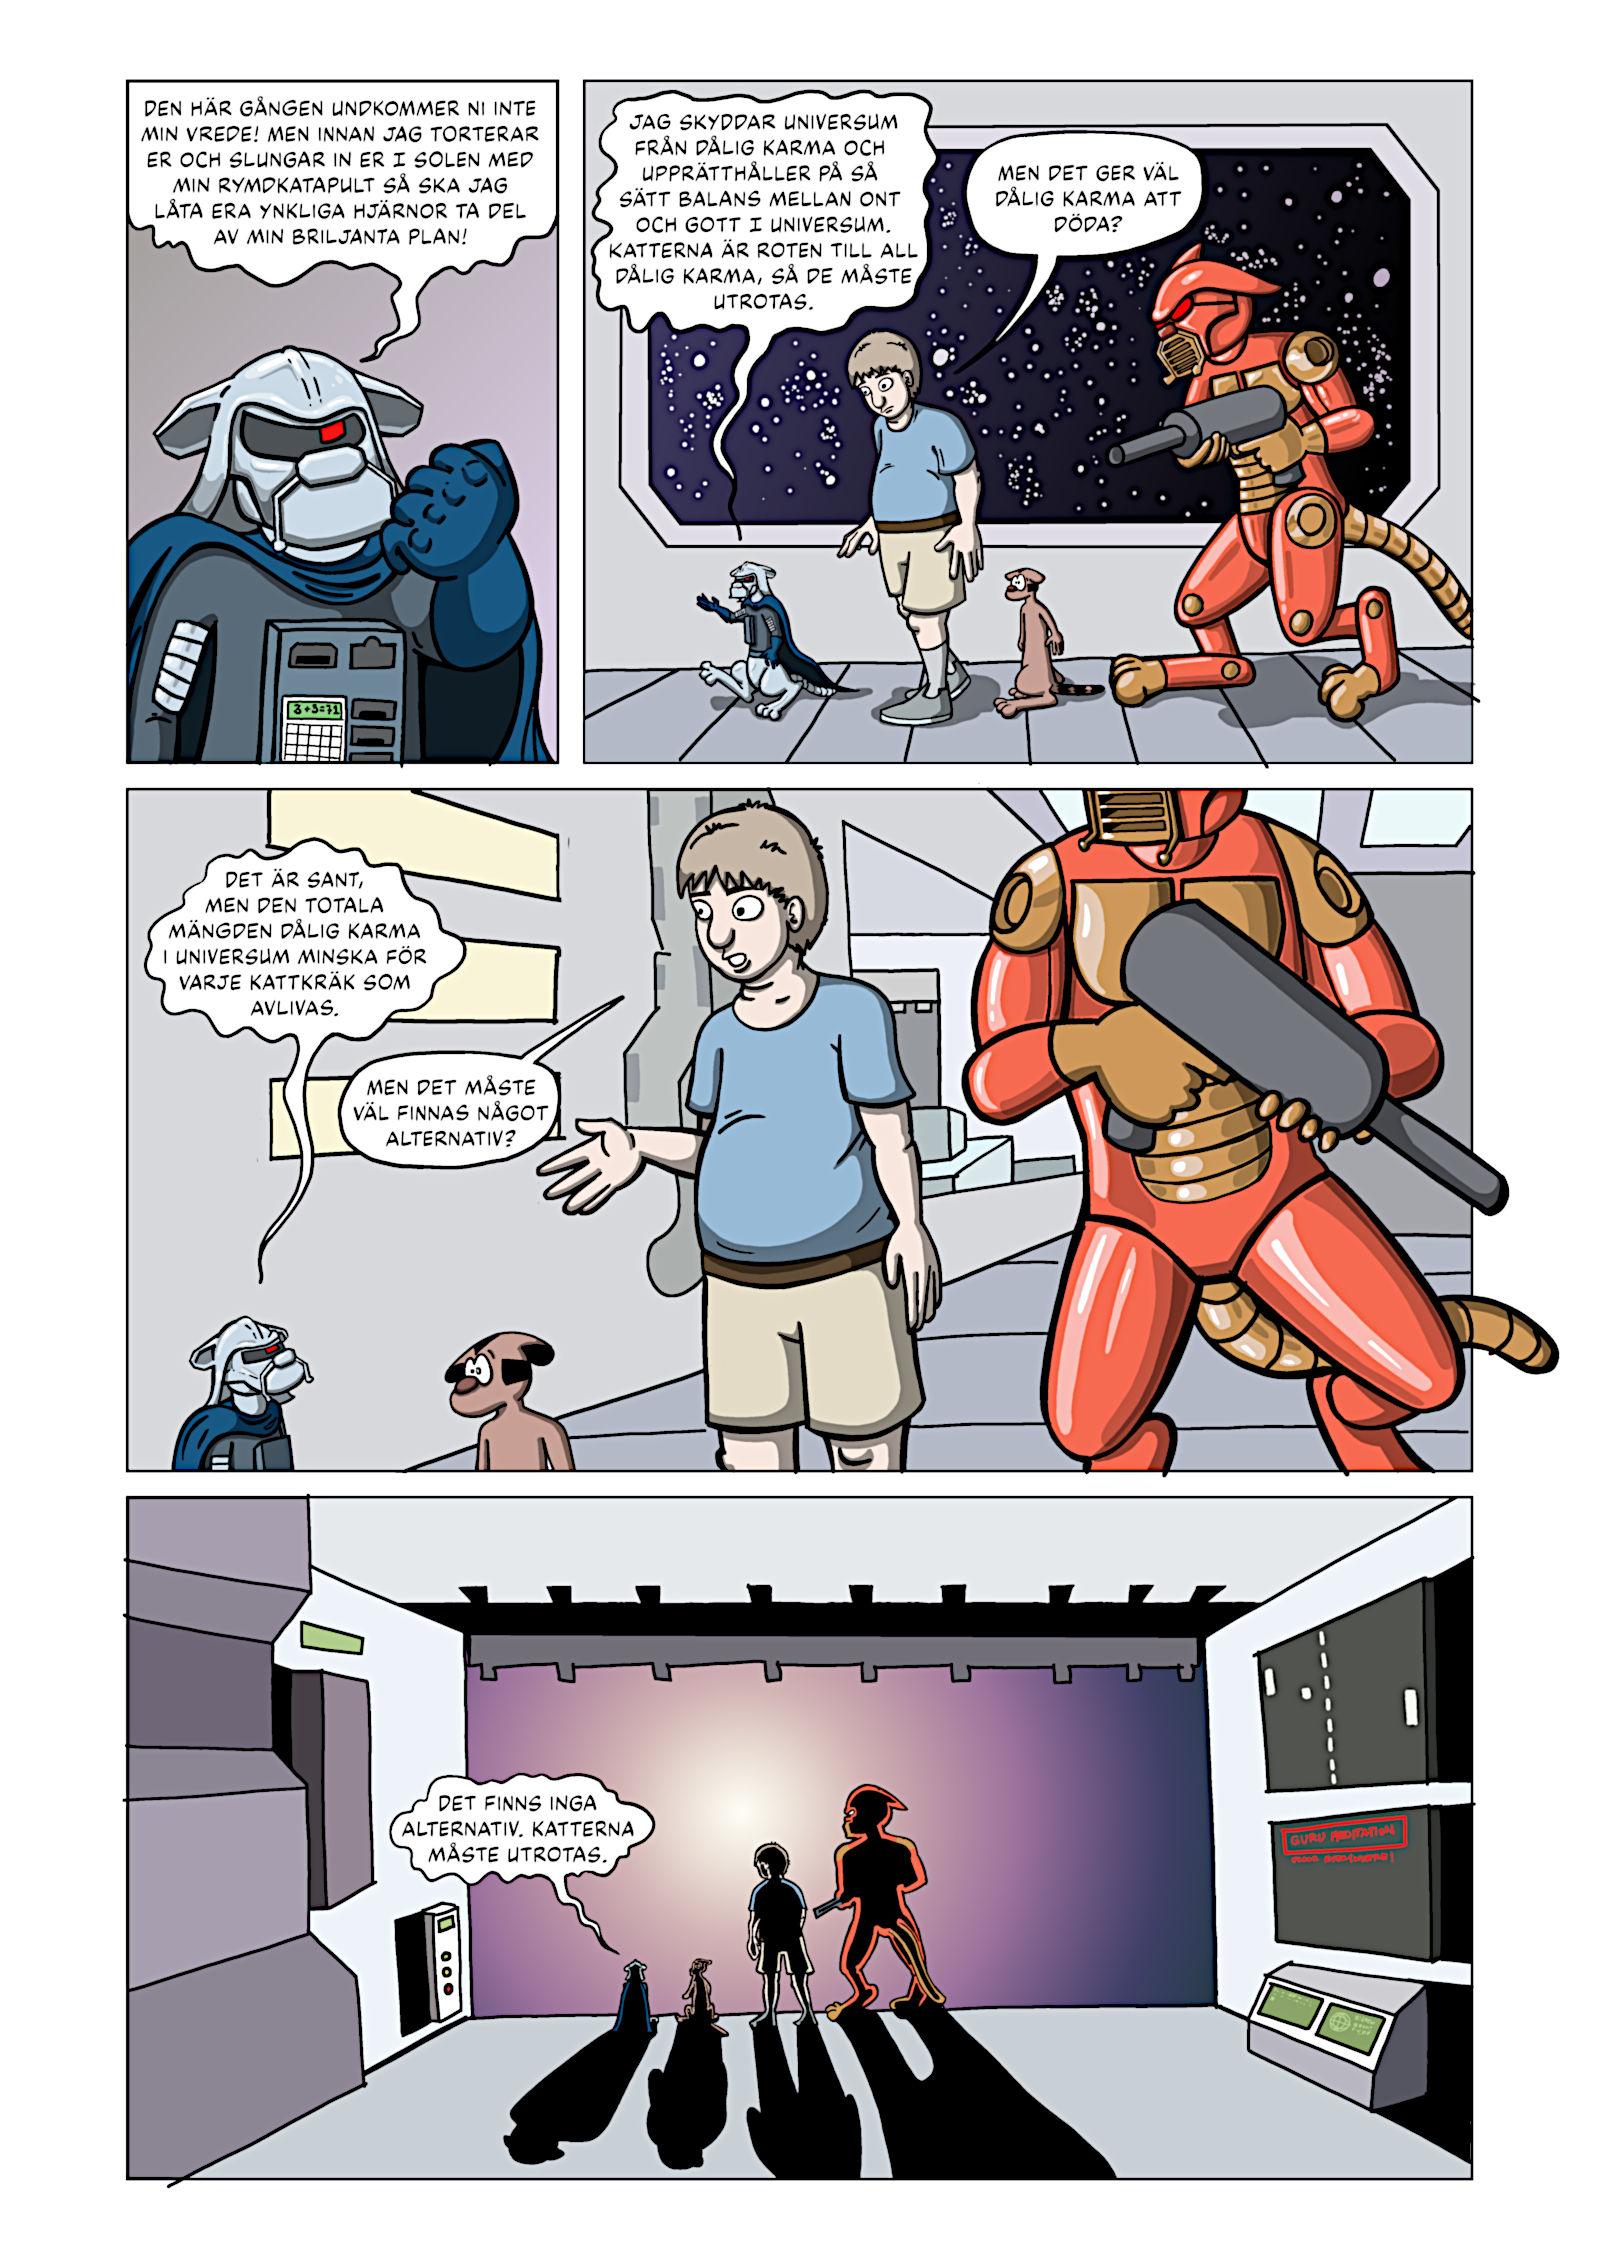 Rymdkatterna Anfaller – Sida 15